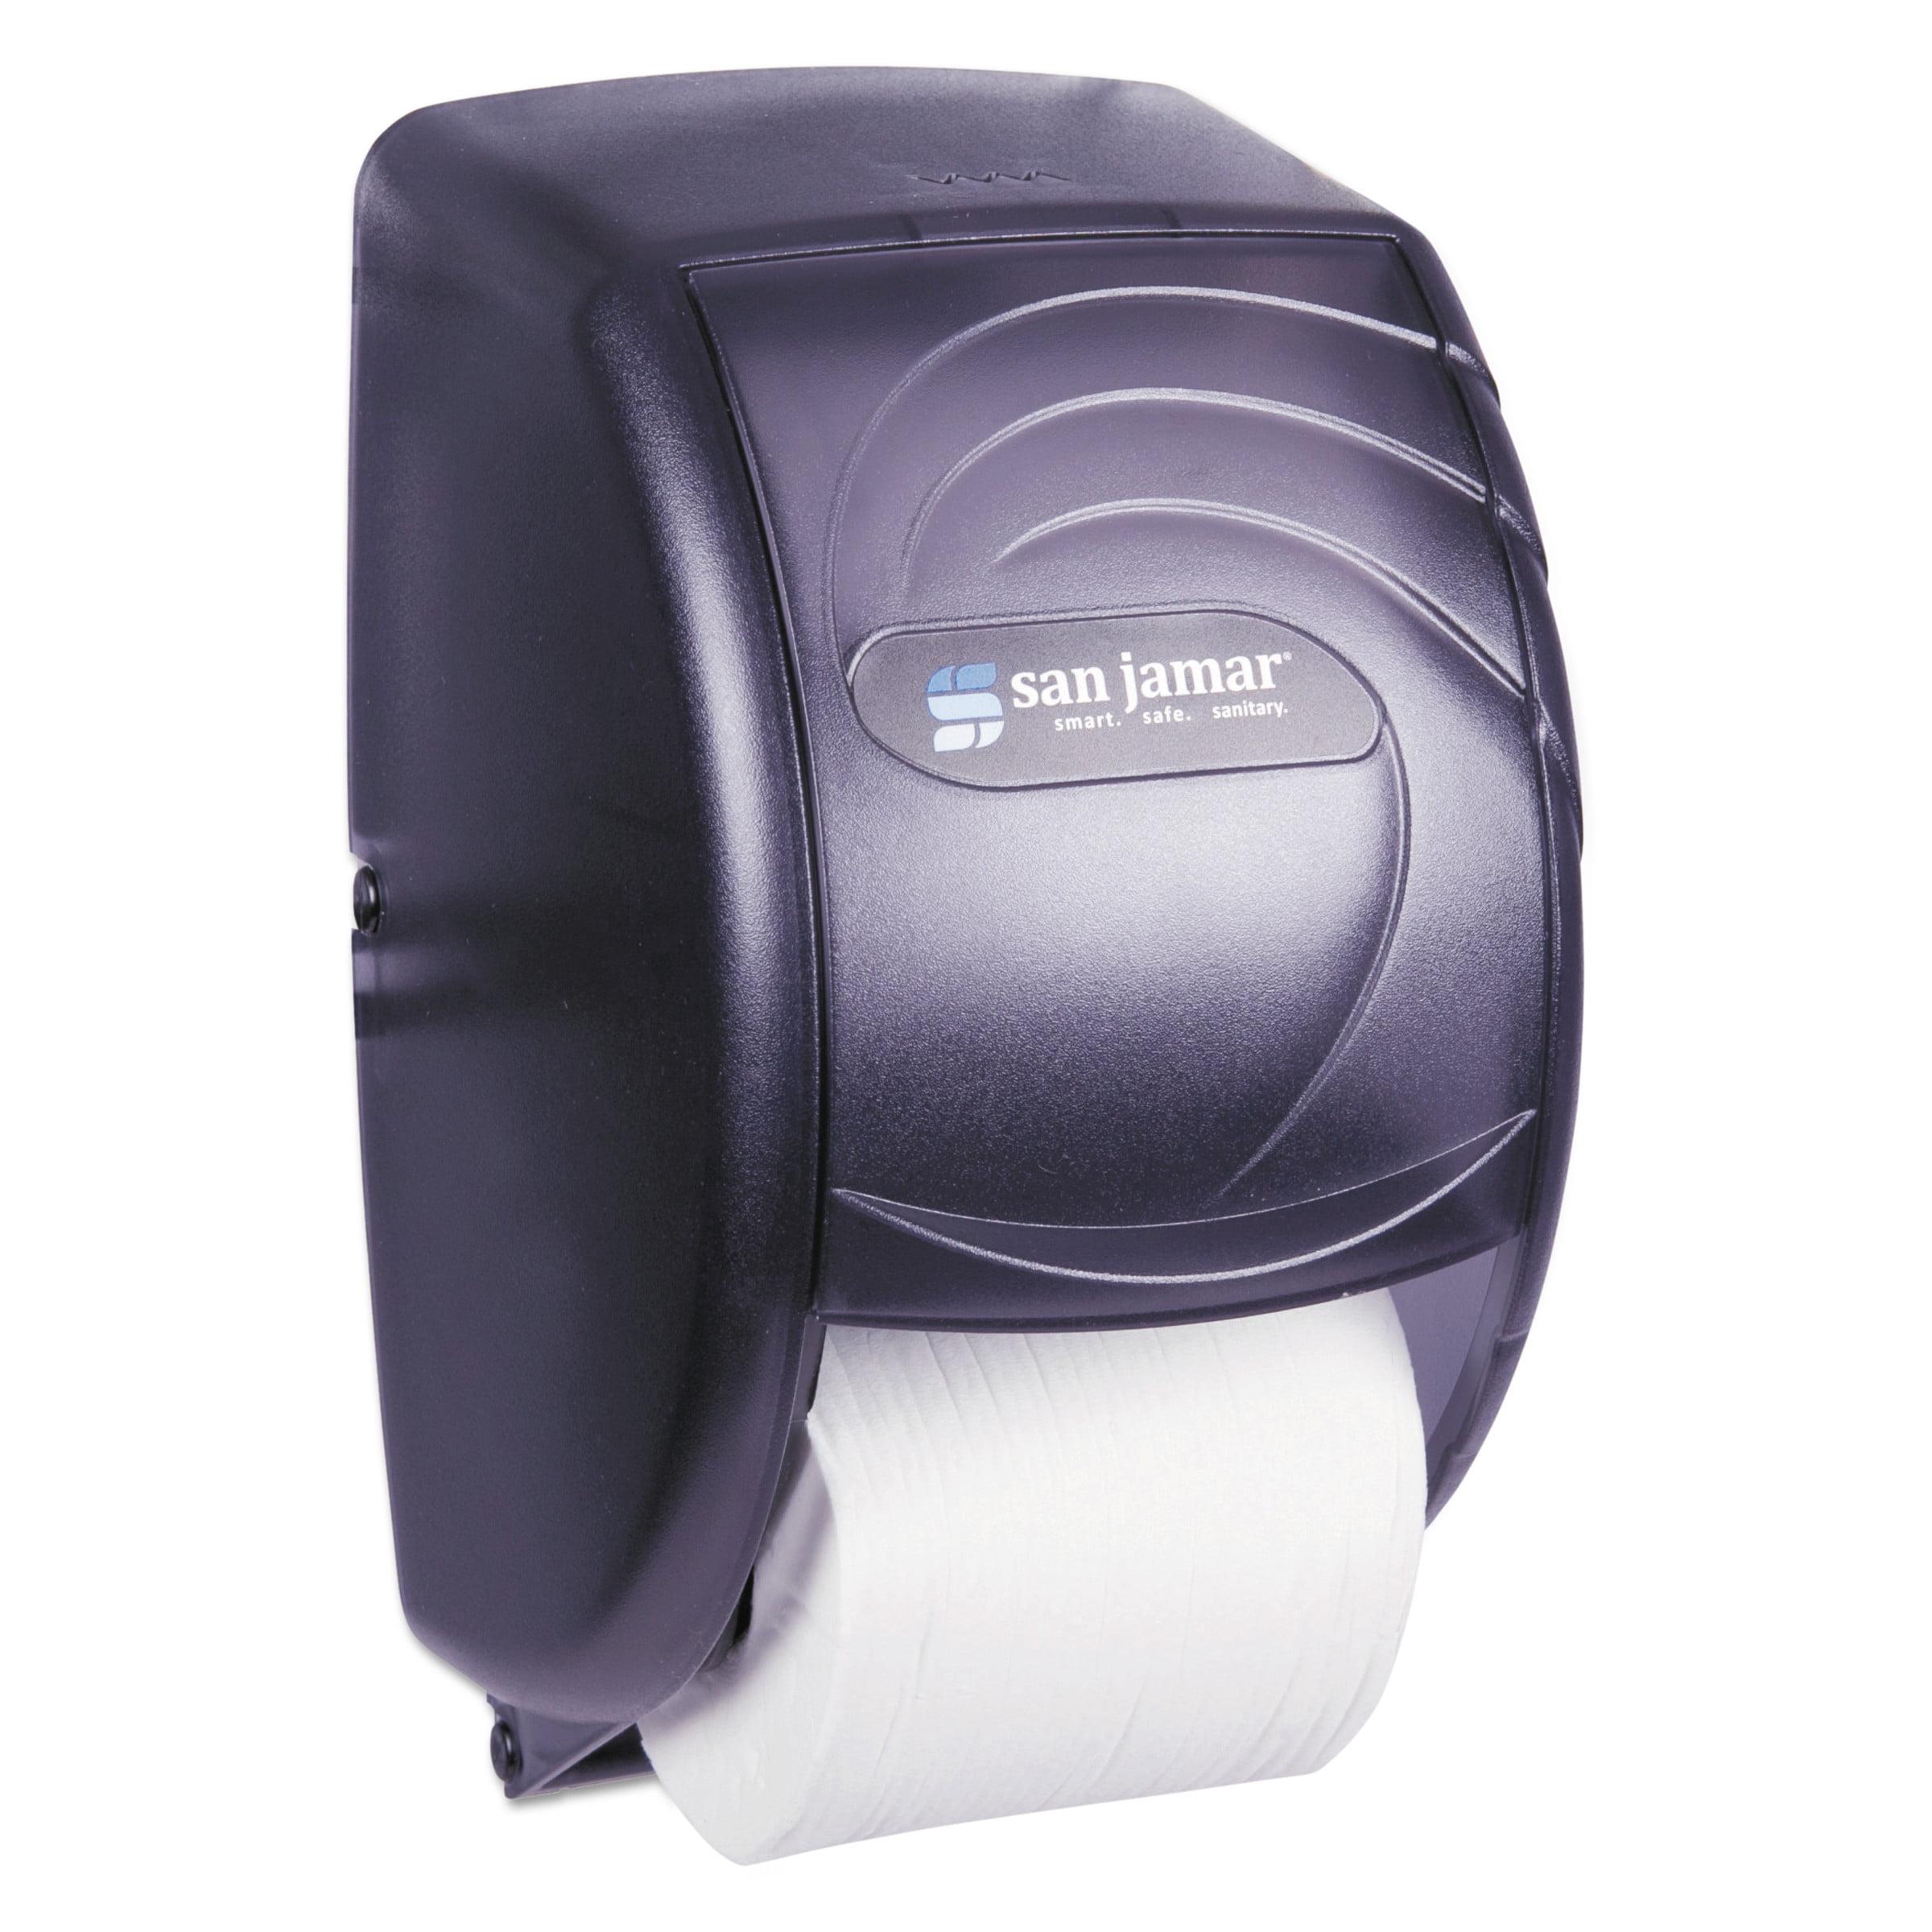 San Jamar Duett Standard Toilet Paper Dispenser, Oceans, 7 1/2 x 7 x 12 3/4, Black Pearl -SJMR3590TBK